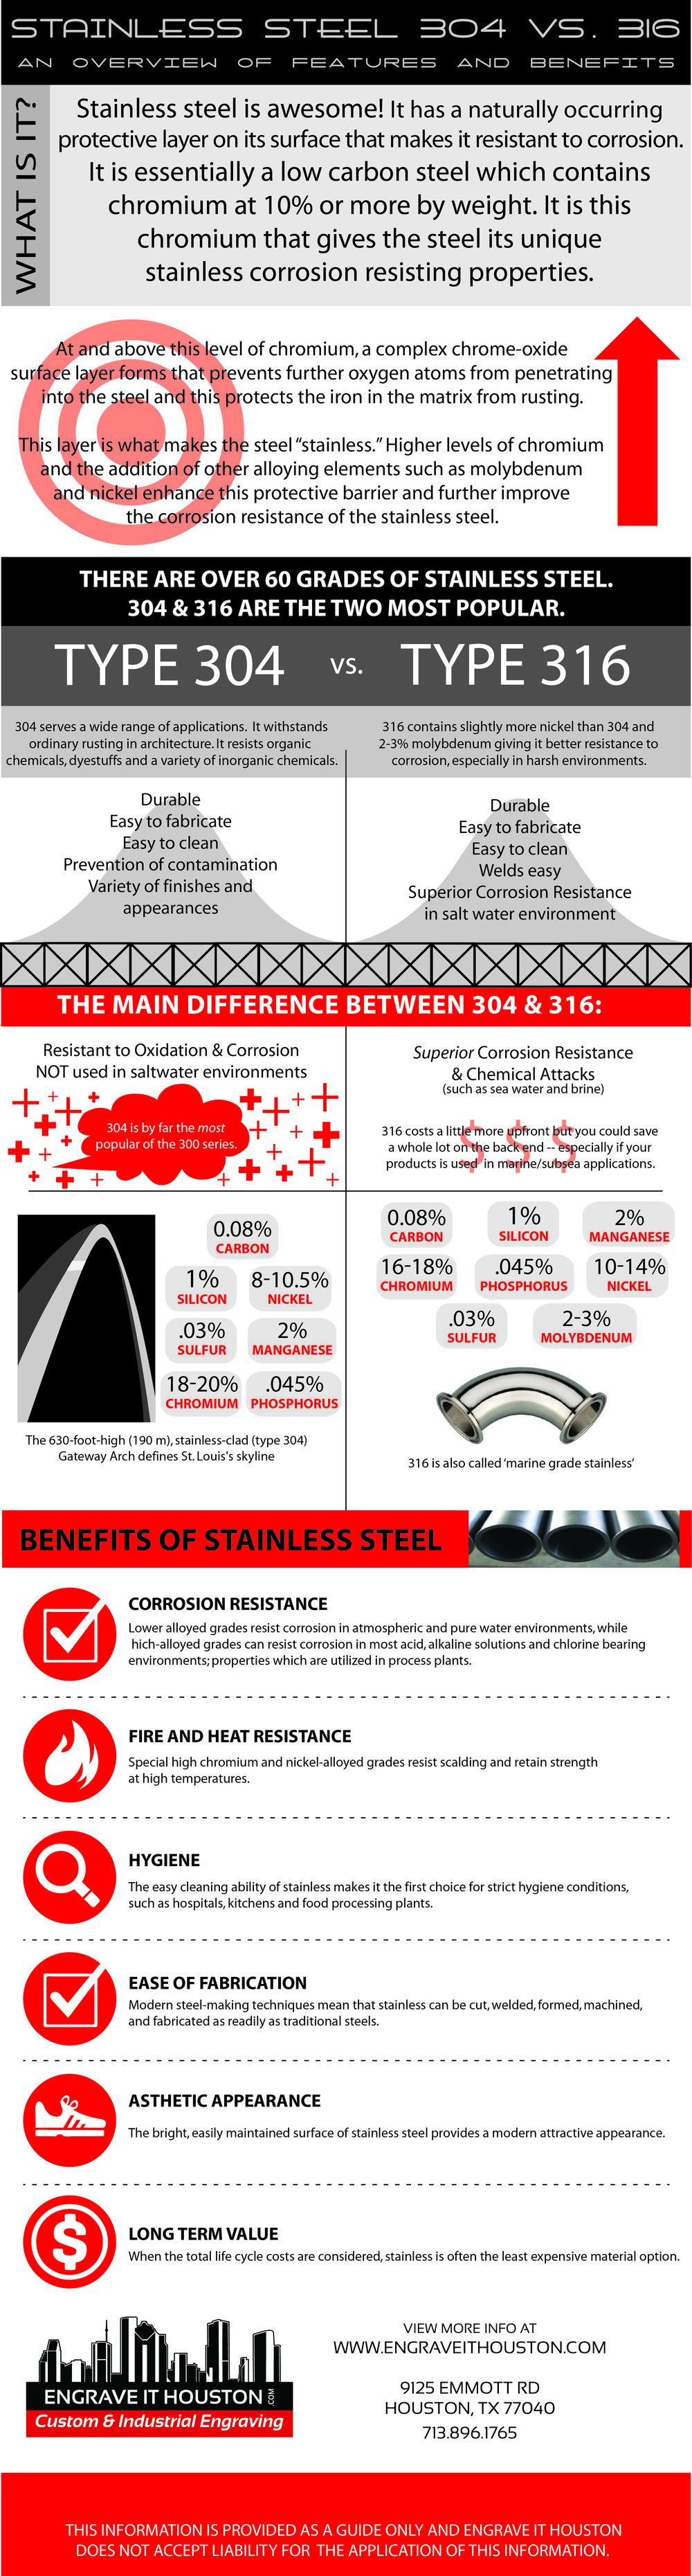 Infographic_StainlessSteel.jpg